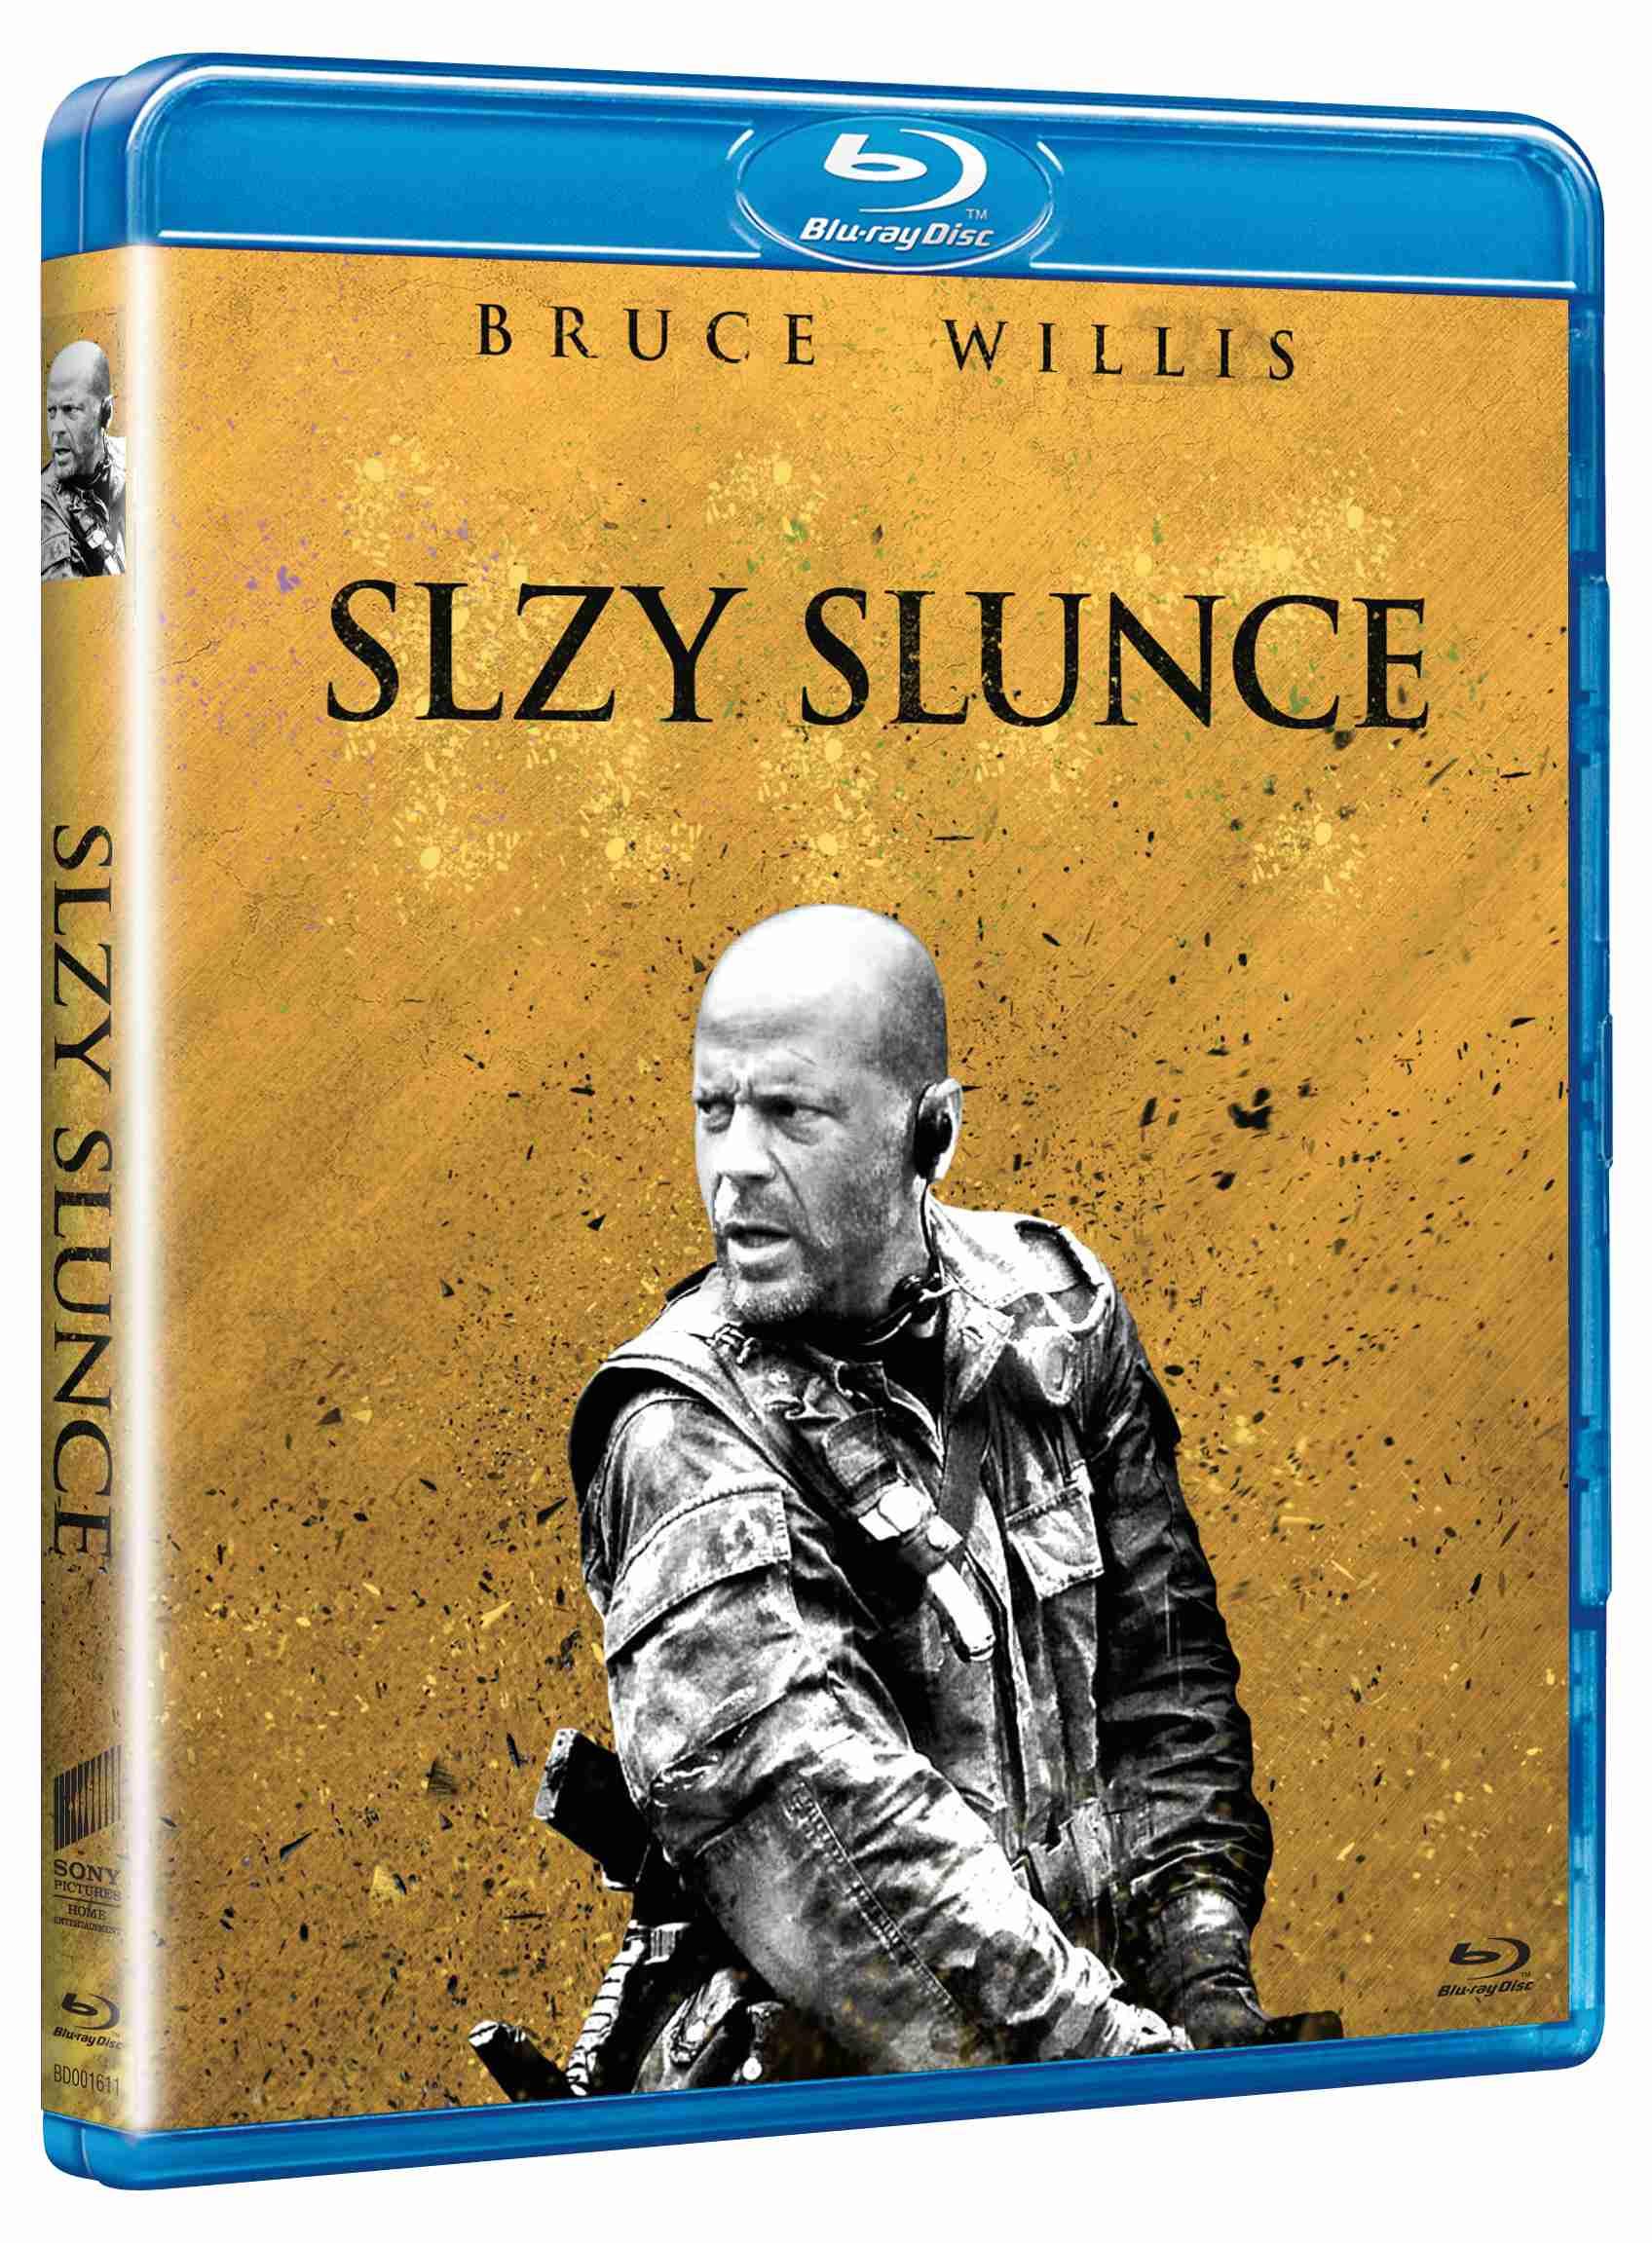 SLZY SLUNCE (Big Face) - Blu-ray